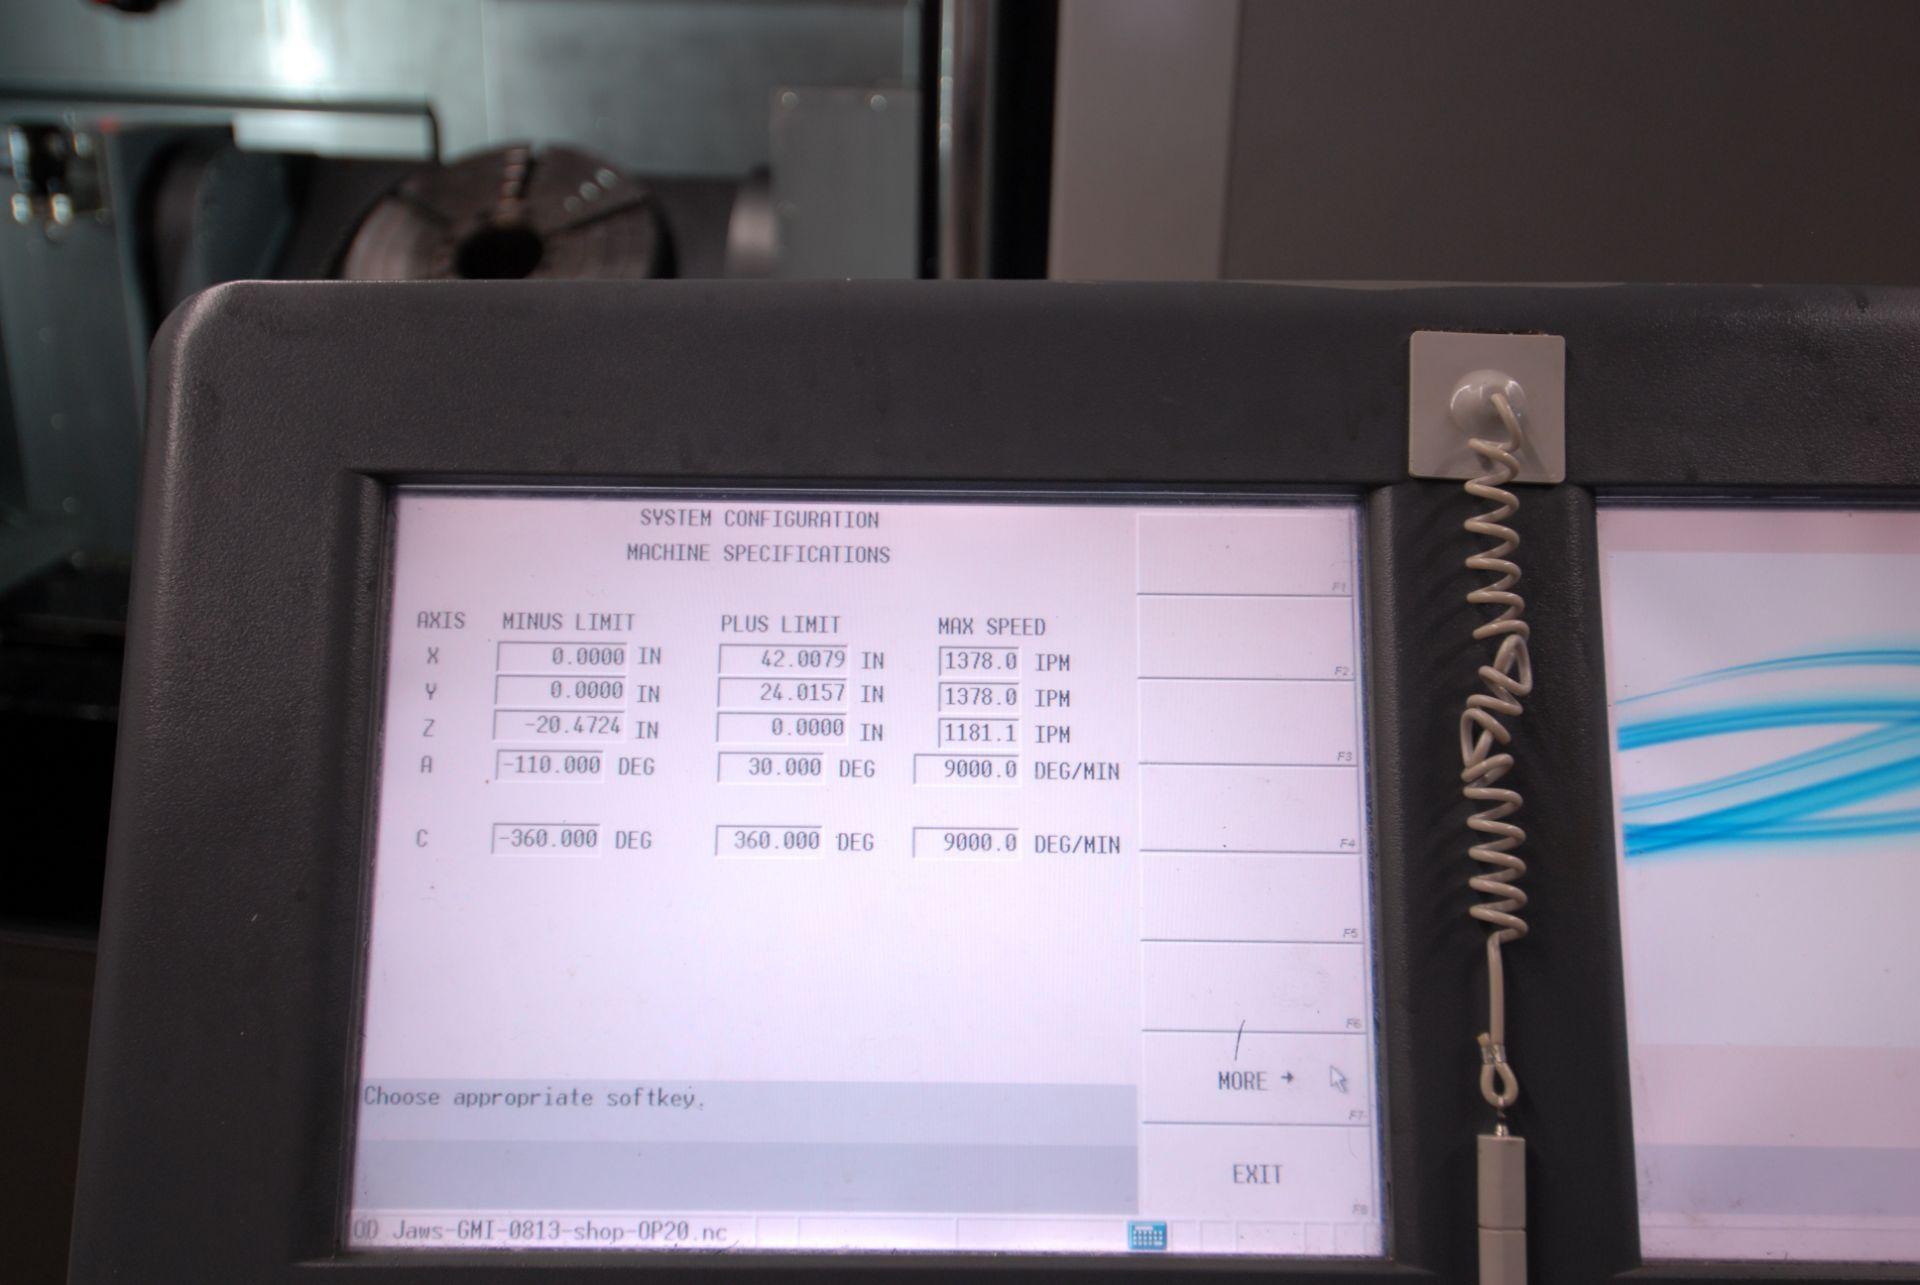 HURCO (2012) VMX42UI 5 AXIS CNC VERTICAL MACHINING CENTER WITH HURCO DUAL SCREEN CNC CONTROL, 13. - Image 5 of 20